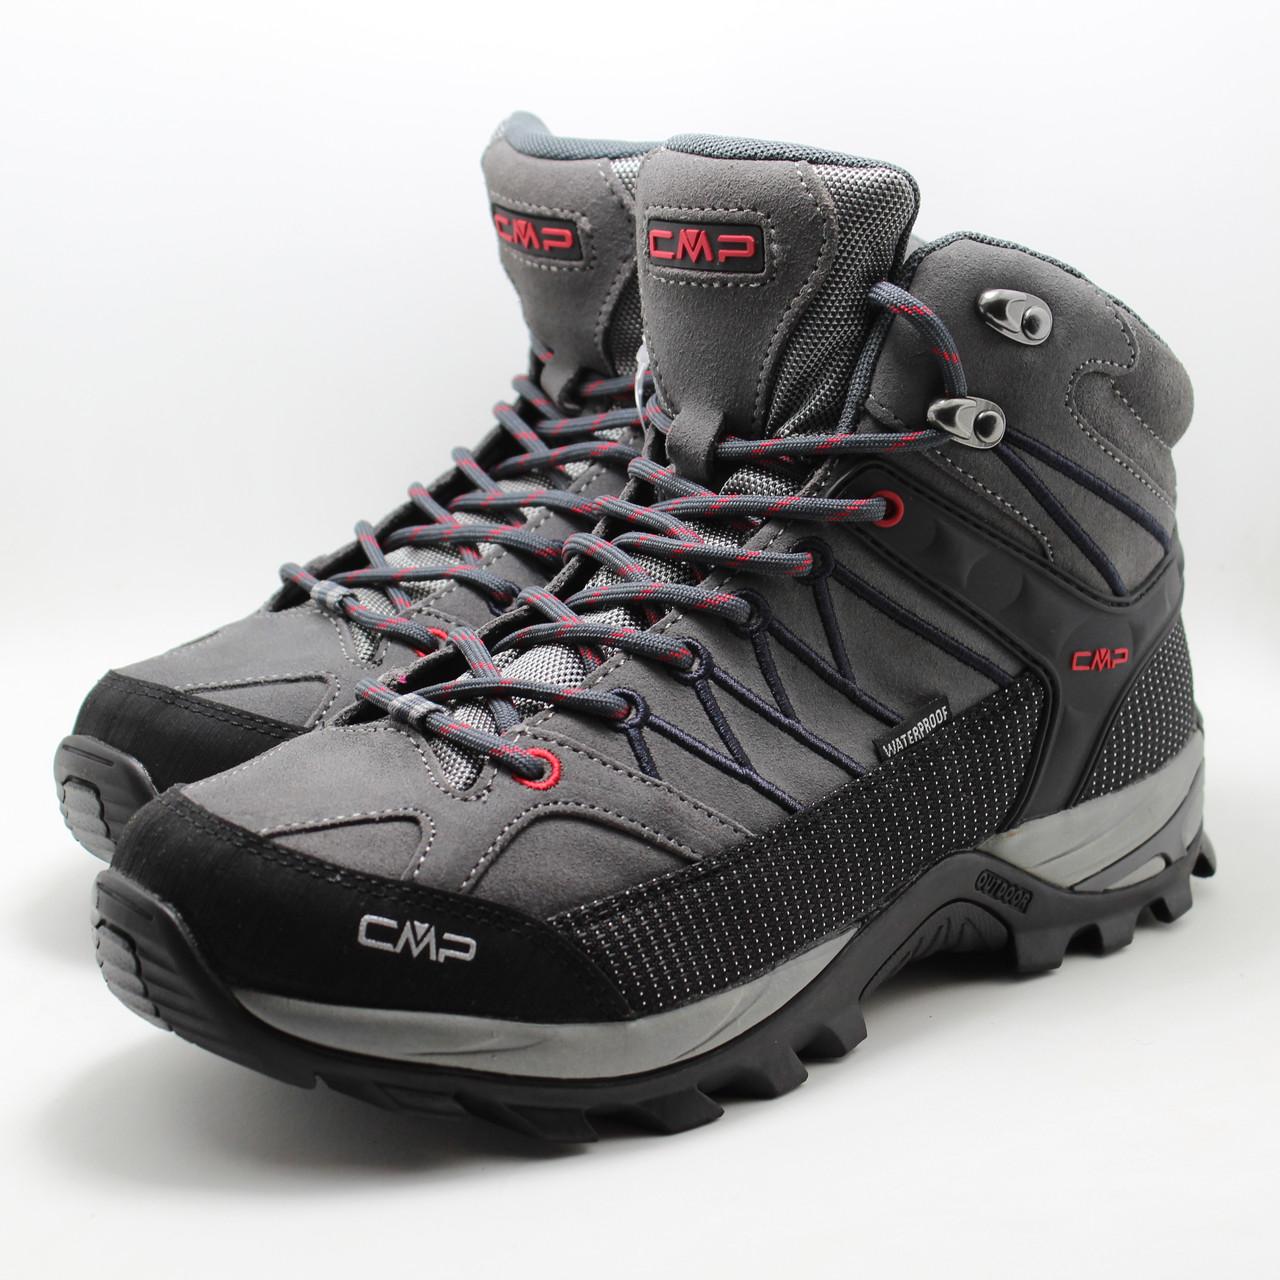 Мужские трекинговые термо-ботинки Cmp Campagnolo 3Q12947-44UF